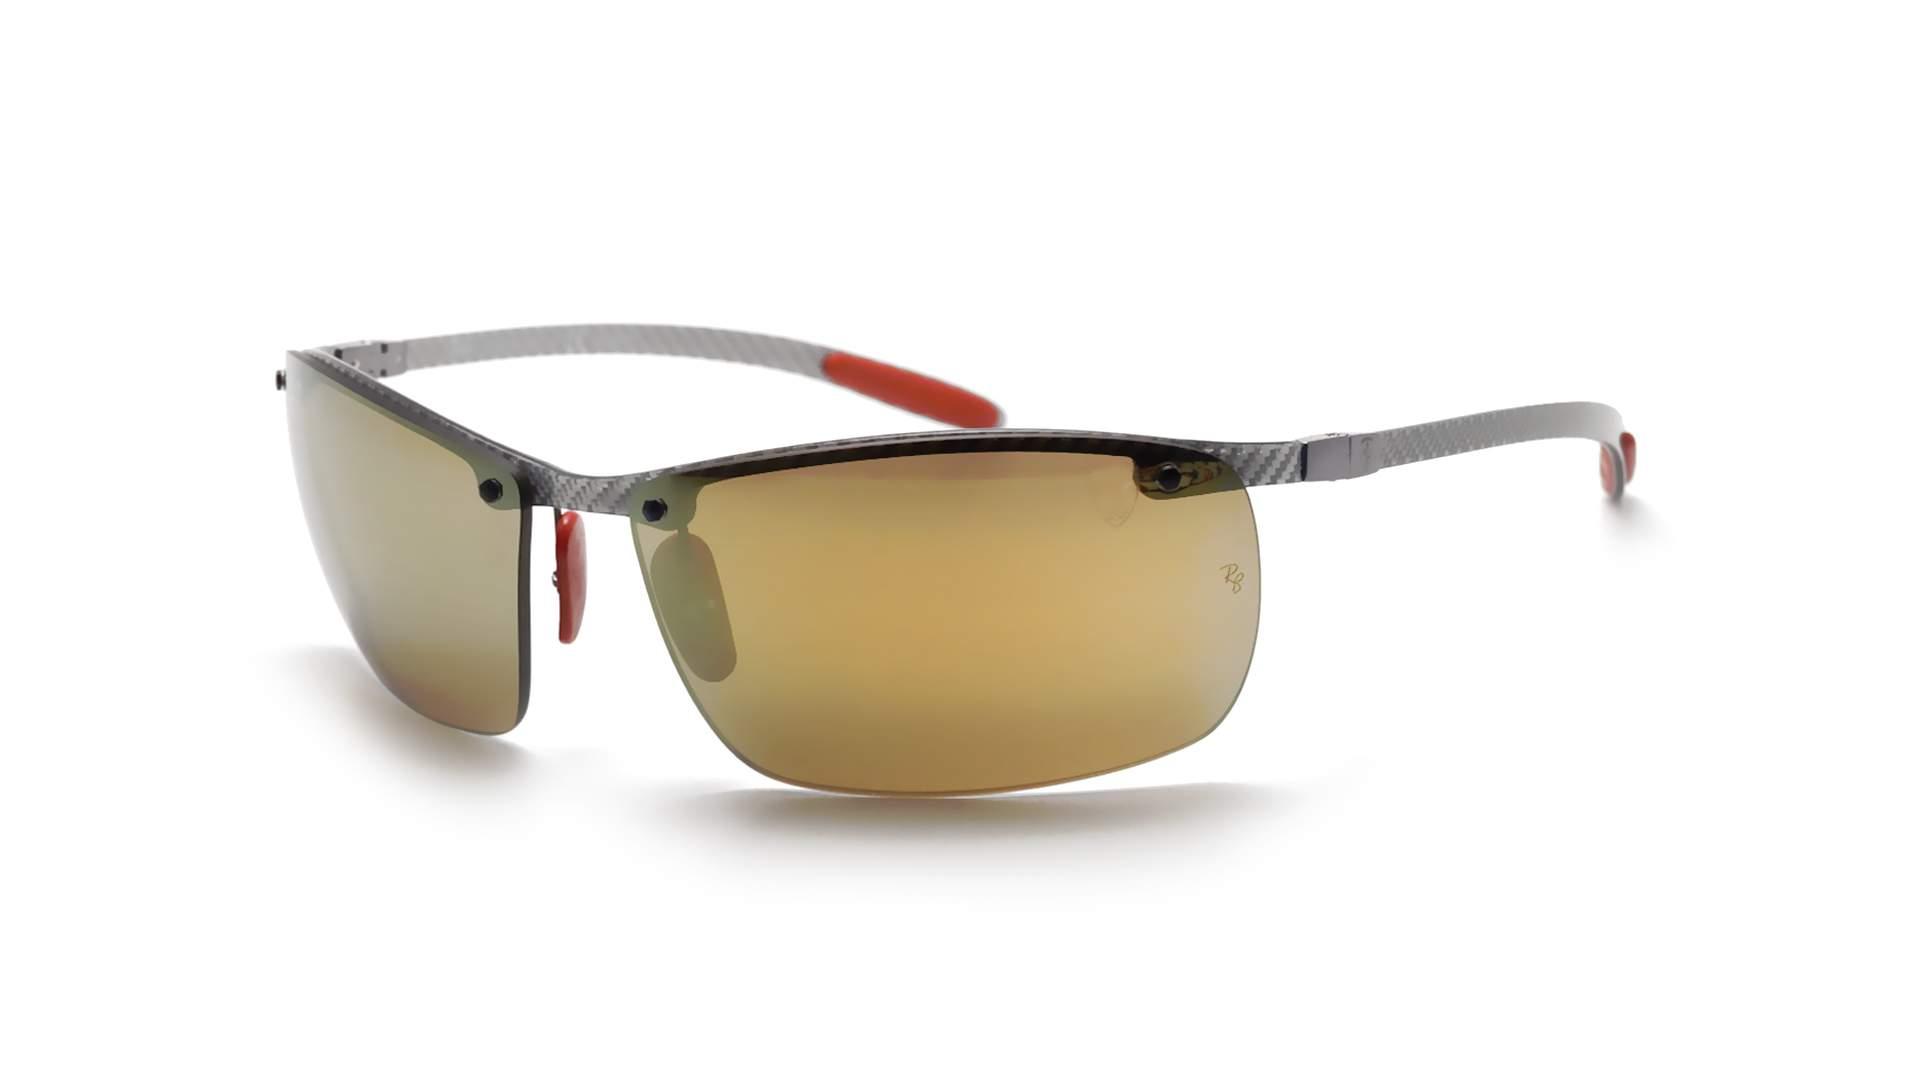 e37d58c0f Sunglasses Ray-Ban Fibre Carbon Scuderia Ferrari Grey Chromance RB8305M  F006/6B 65-14 Large Polarized Mirror